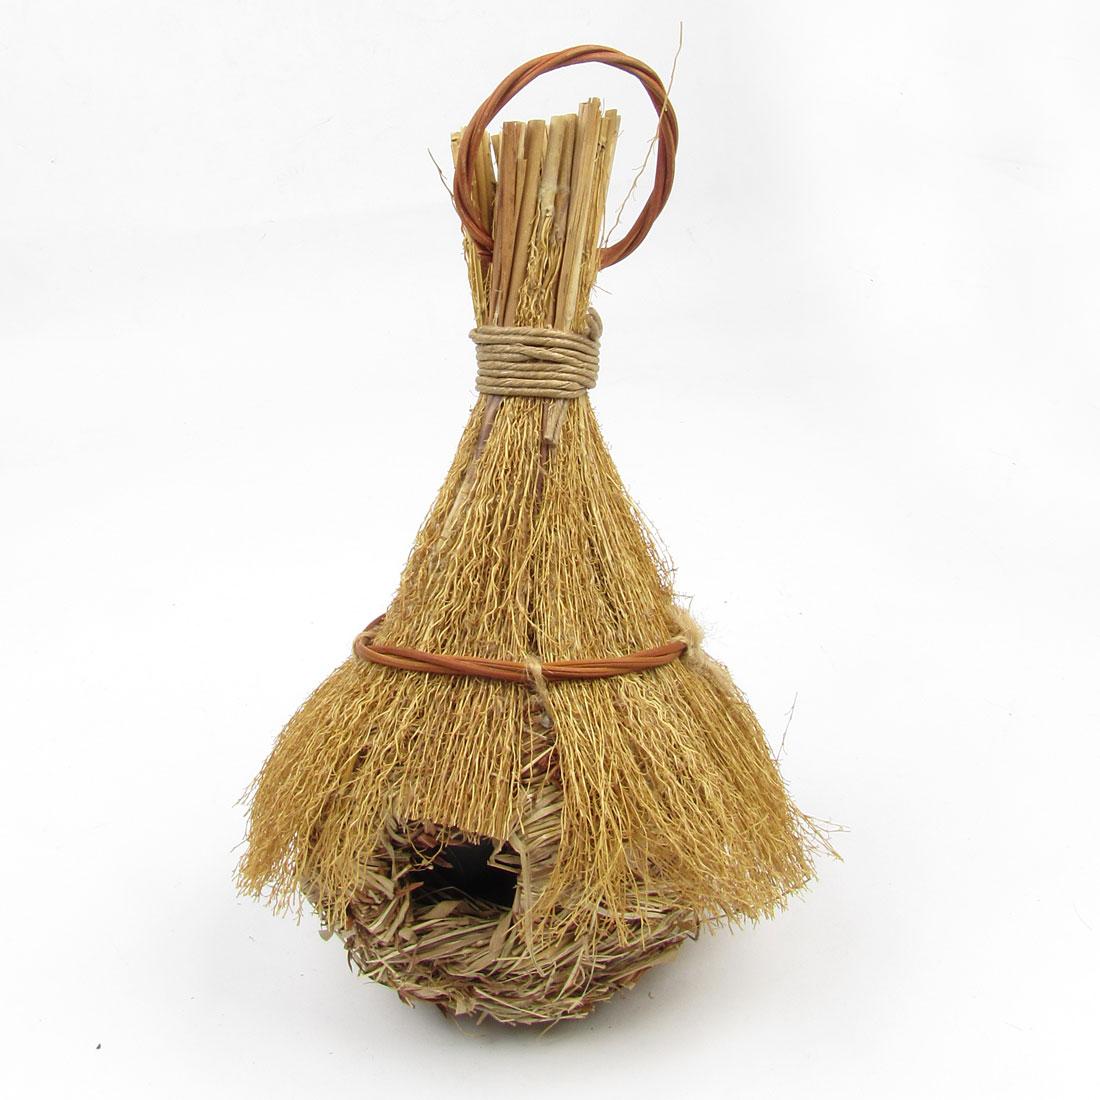 Garden Decor Natural Grass Artificial Birdhouse Home Nest Nesting Wood Color